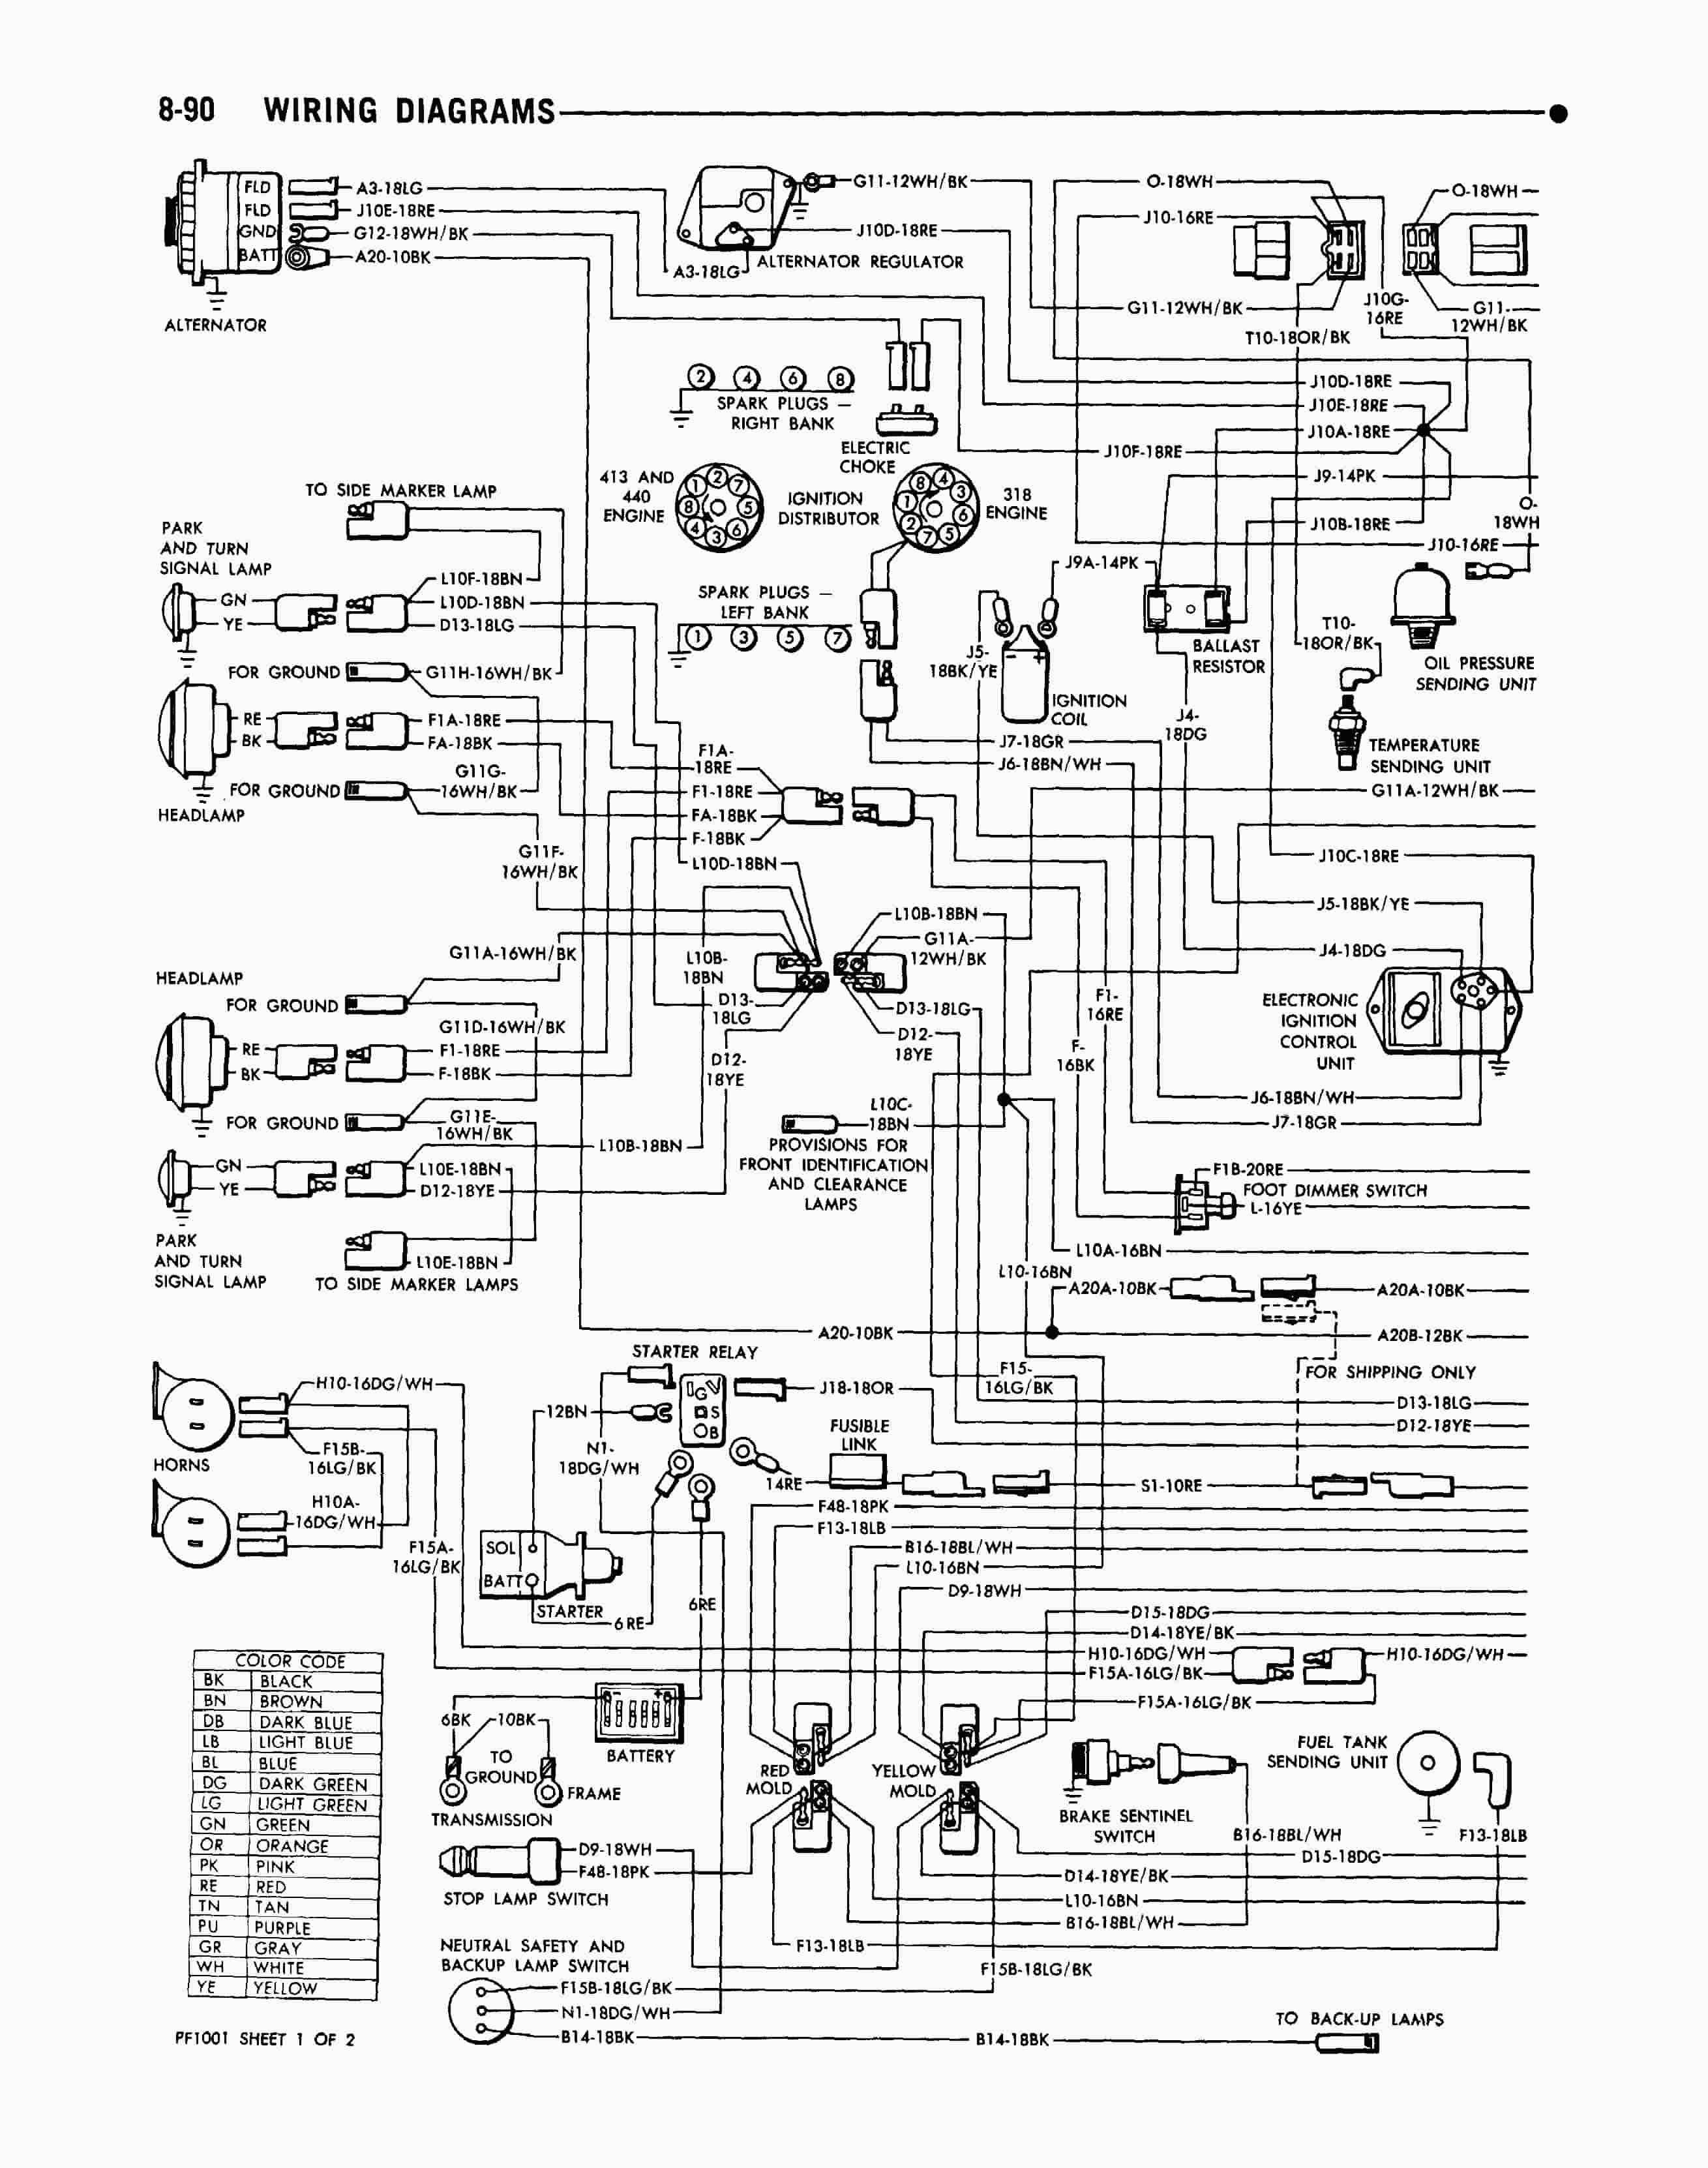 1990 C1500 Reverse Wiring Diagram